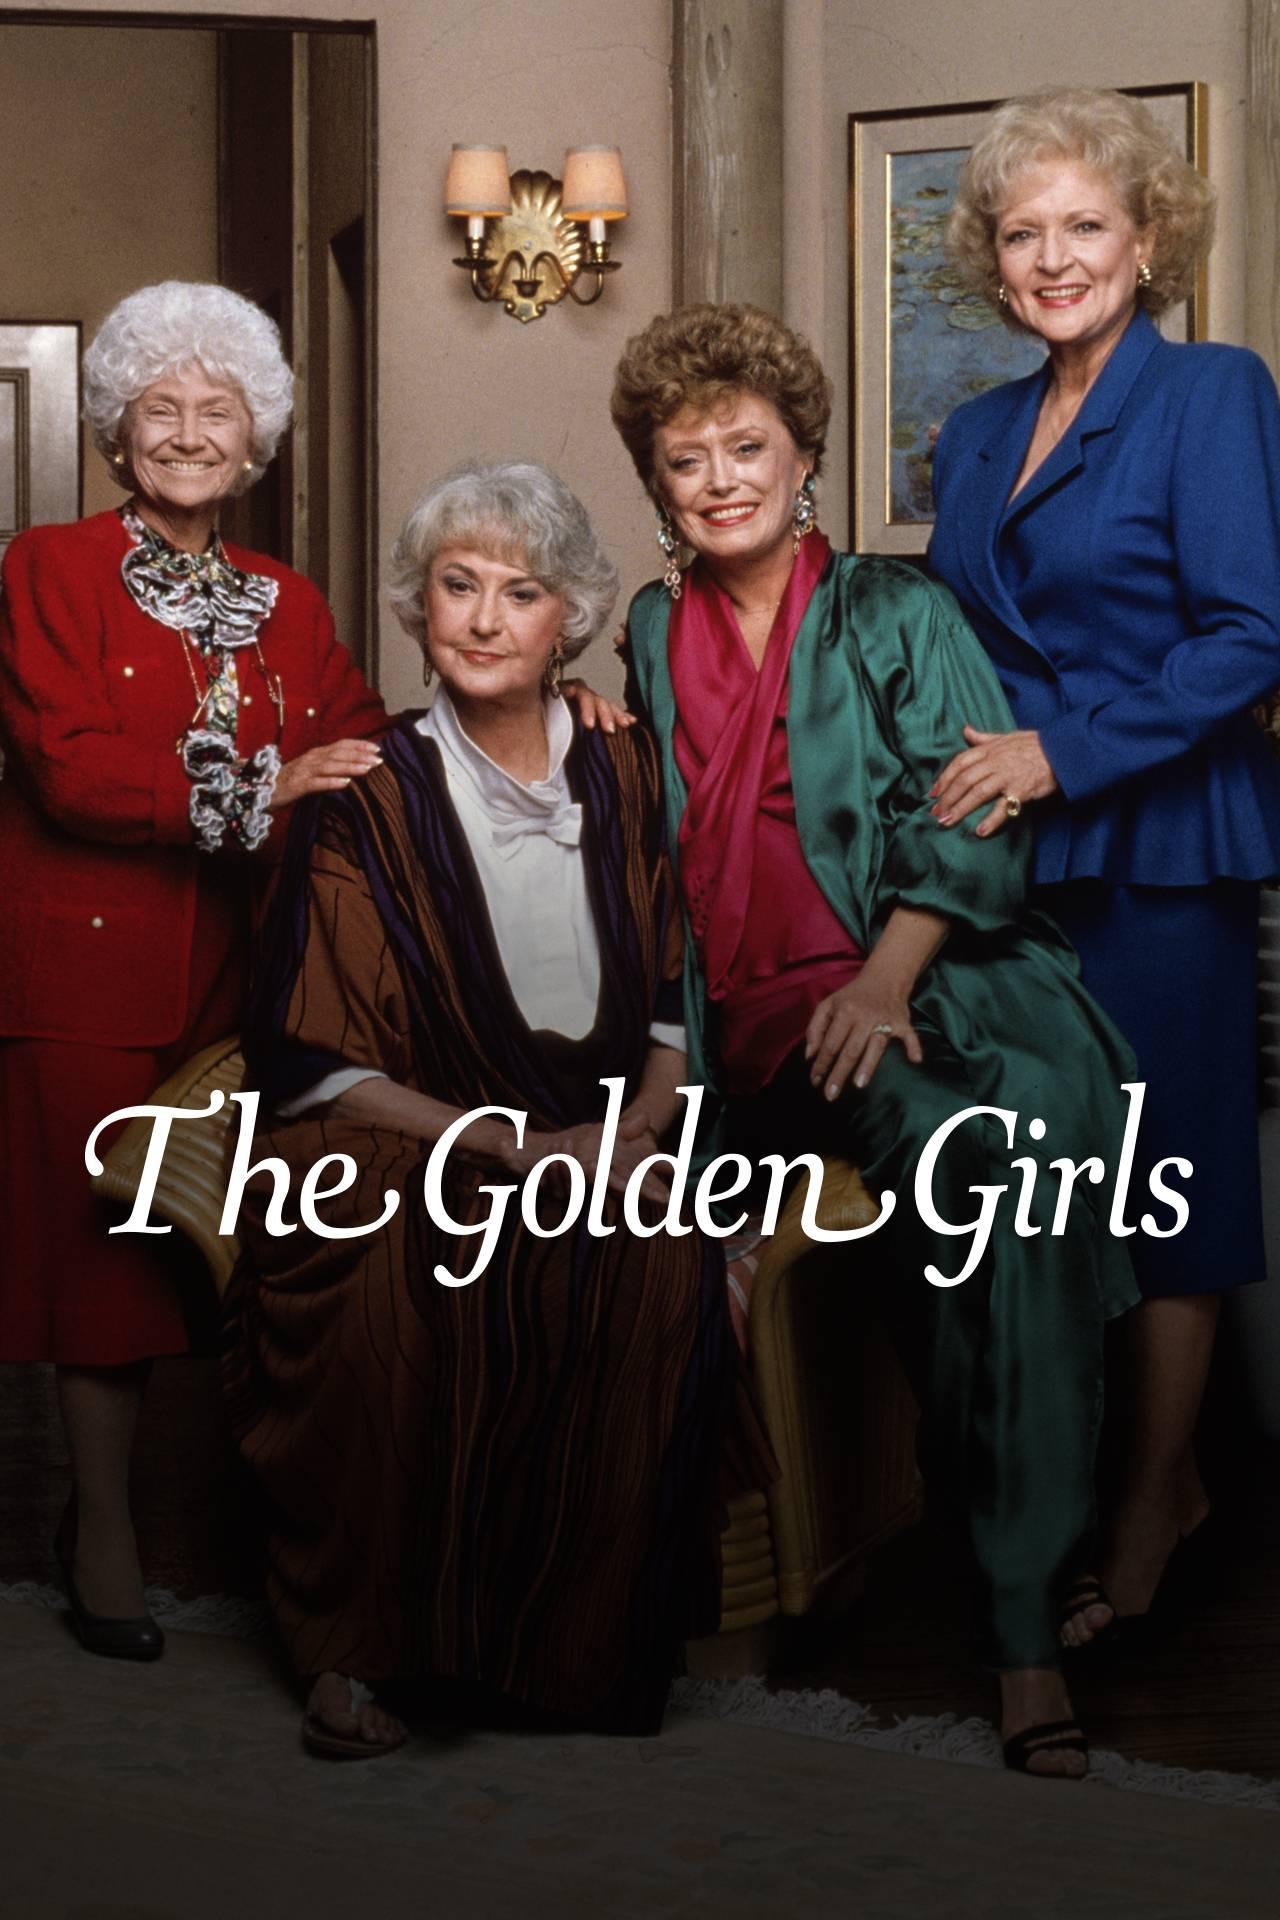 The Golden Girls - Season 7 - TV Series   TV Land